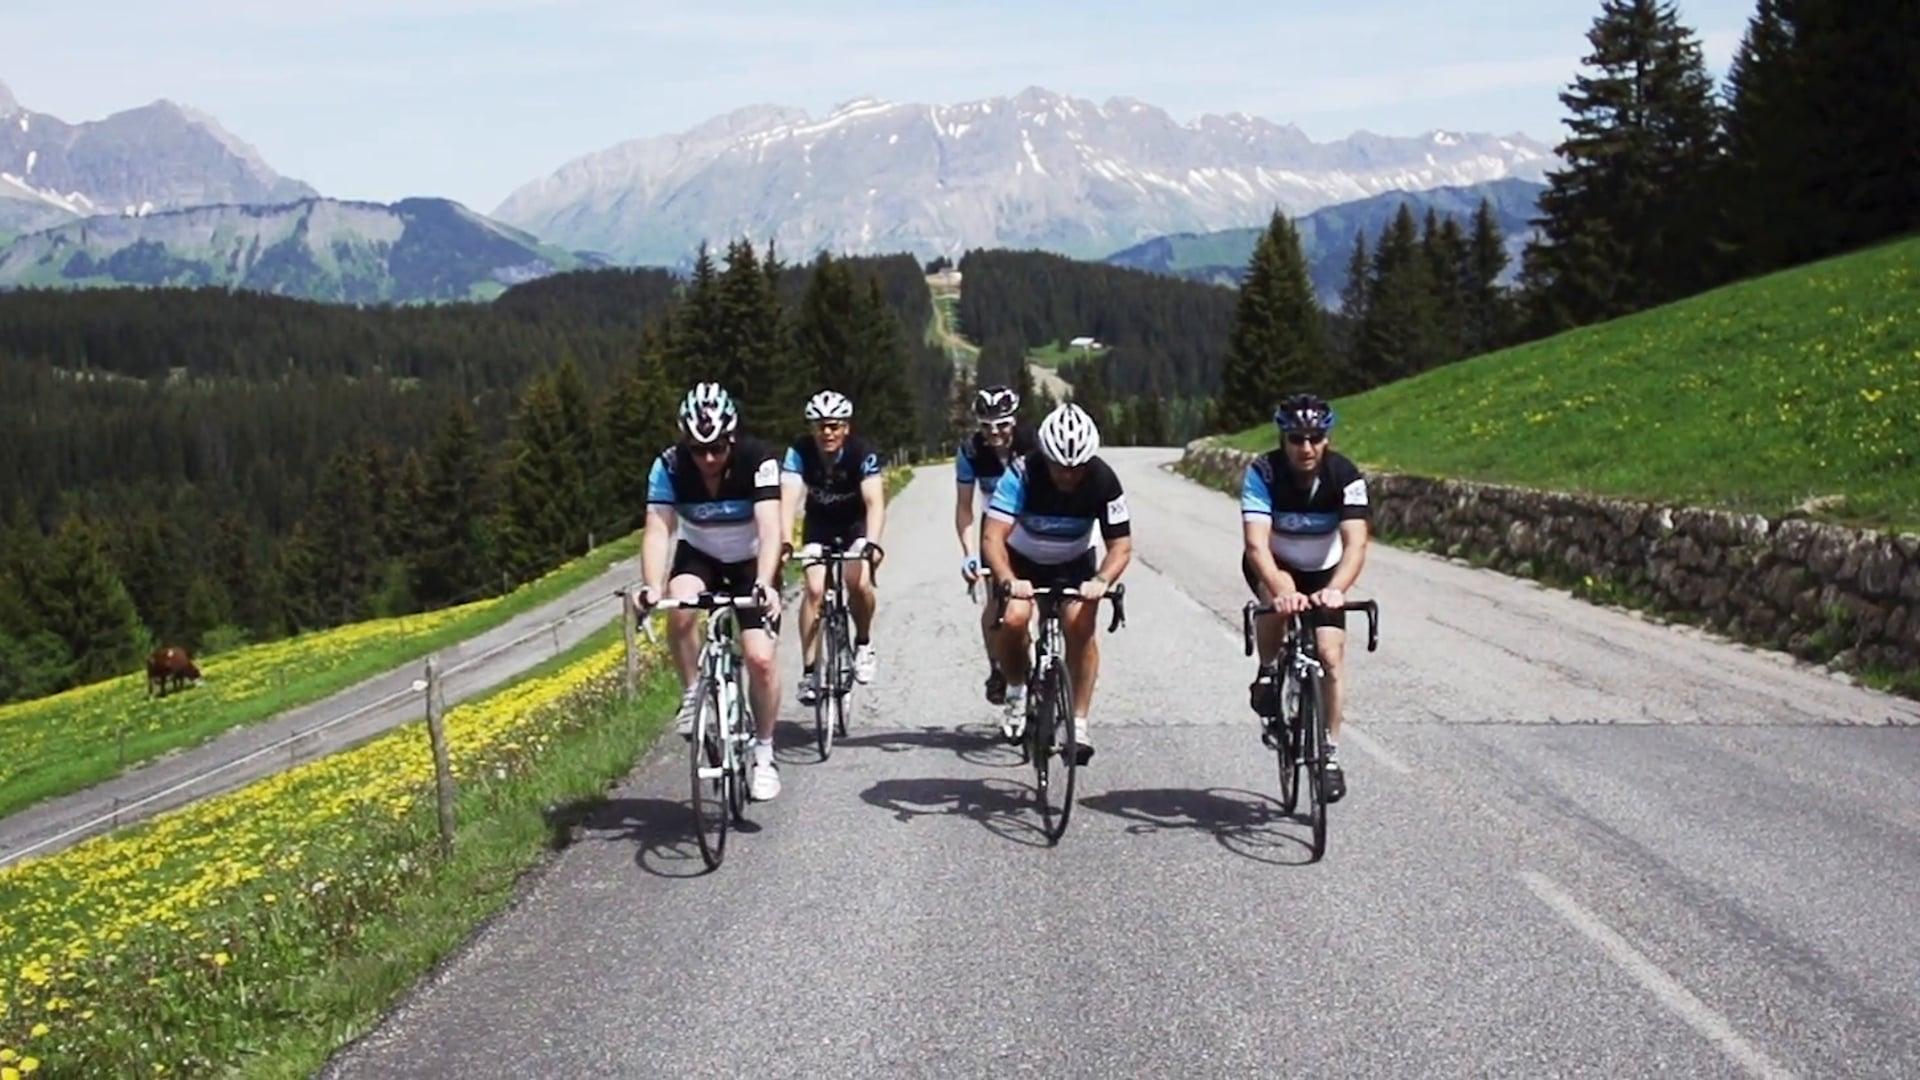 Ripcor: Riding with Mamils